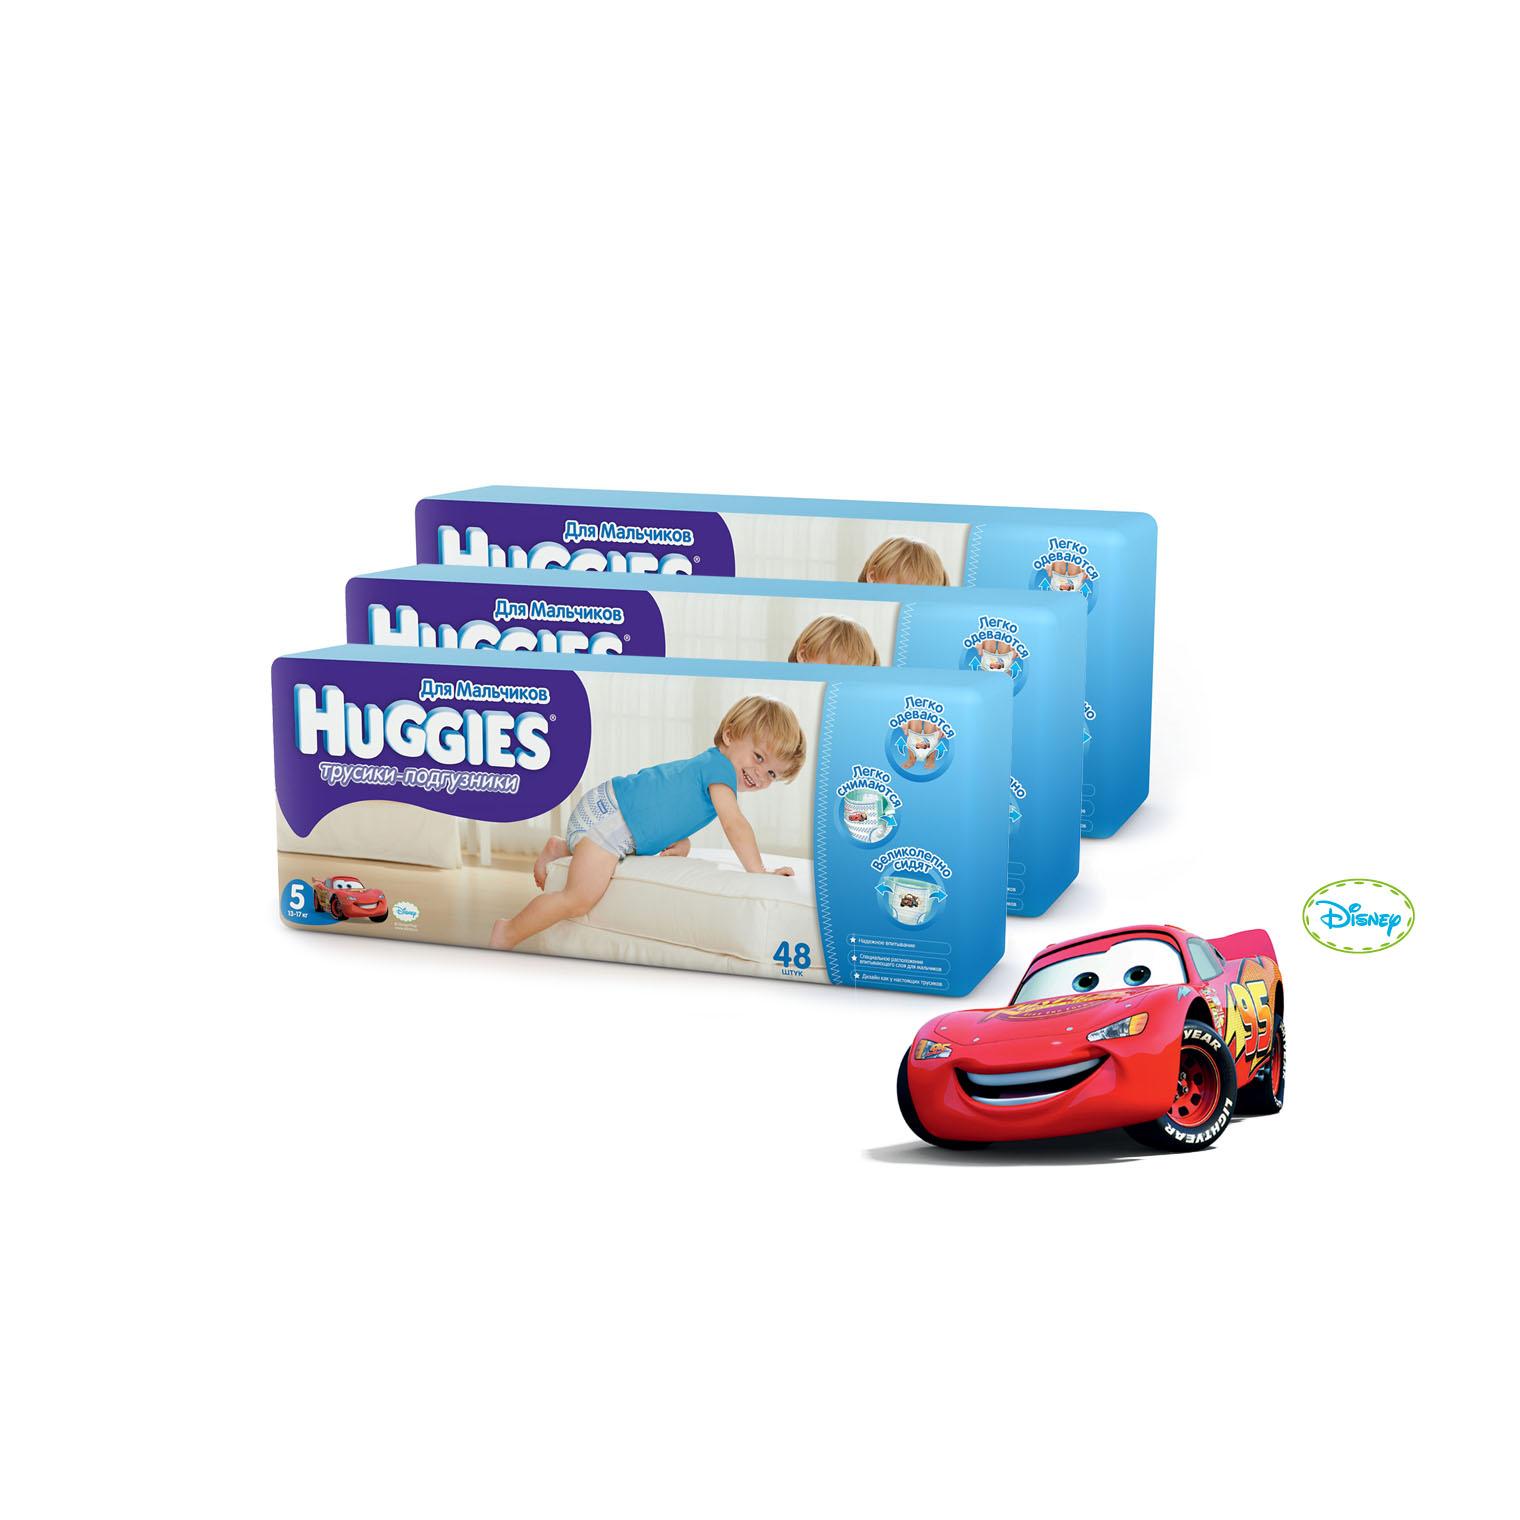 ����� �������� Huggies � 2 ��� ���������� ������ ������ 5